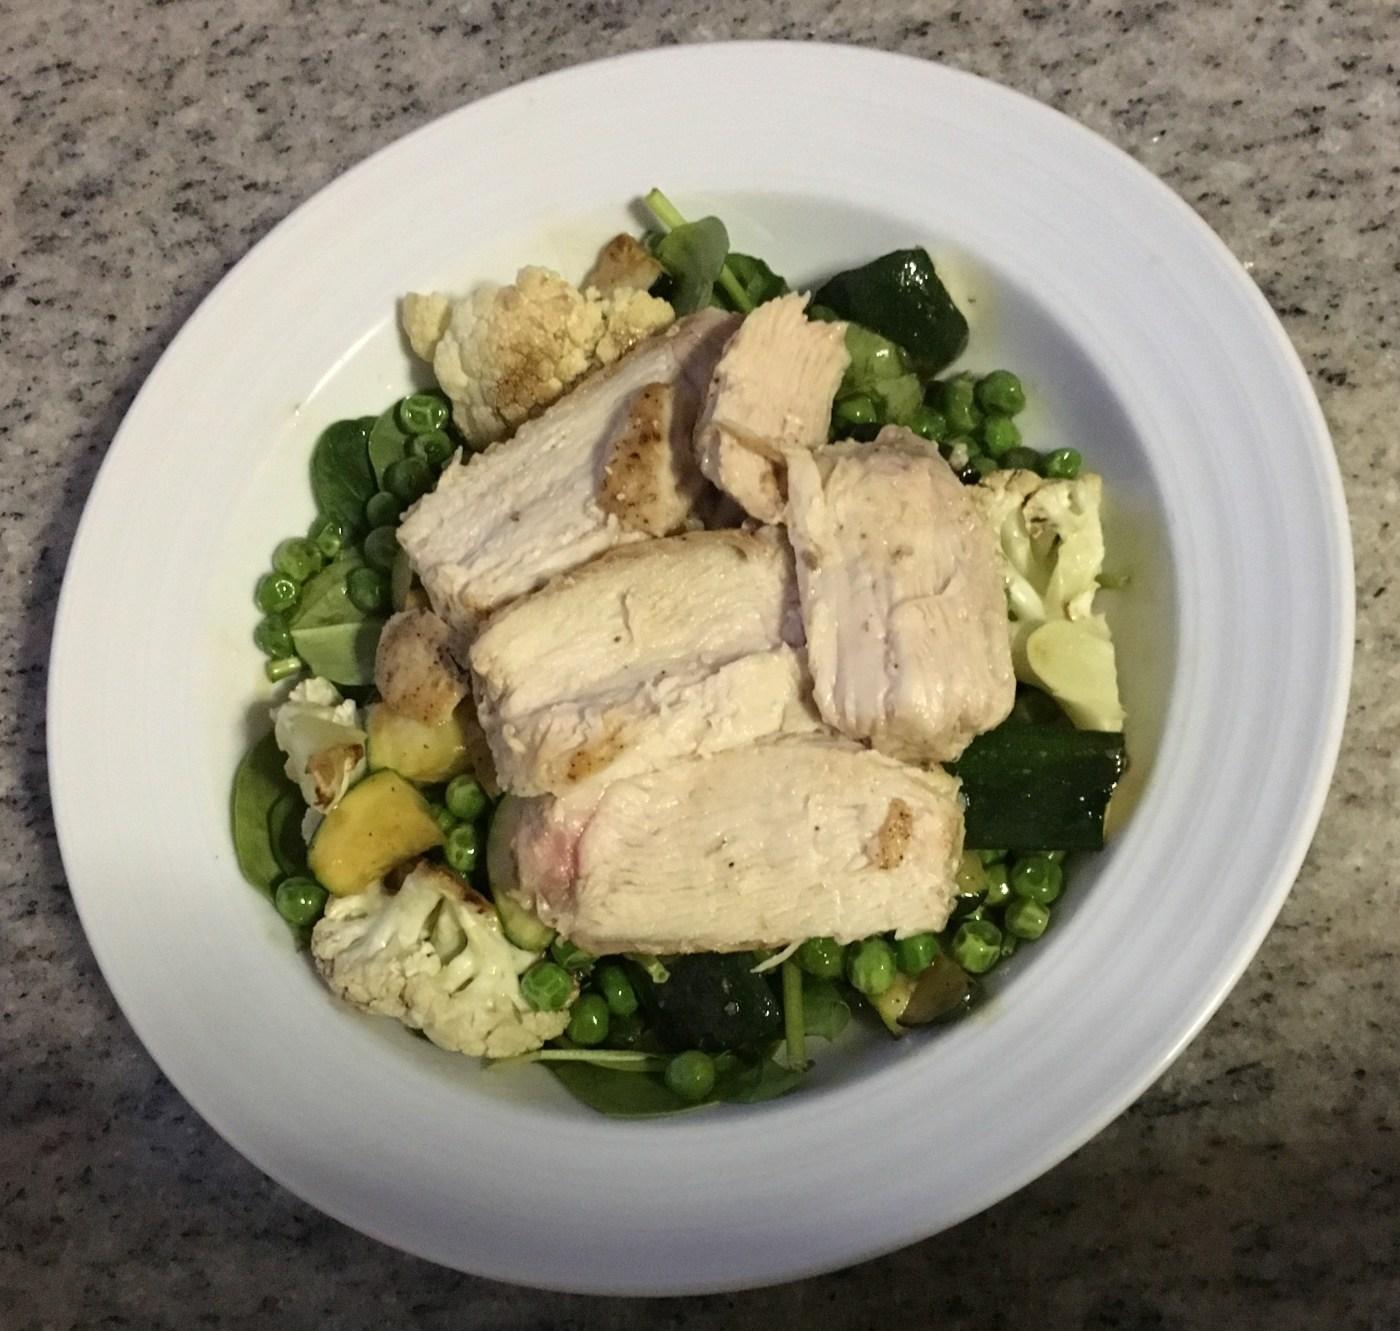 Chicken breast over warm pea, zucchini, cauliflower and spinach salad